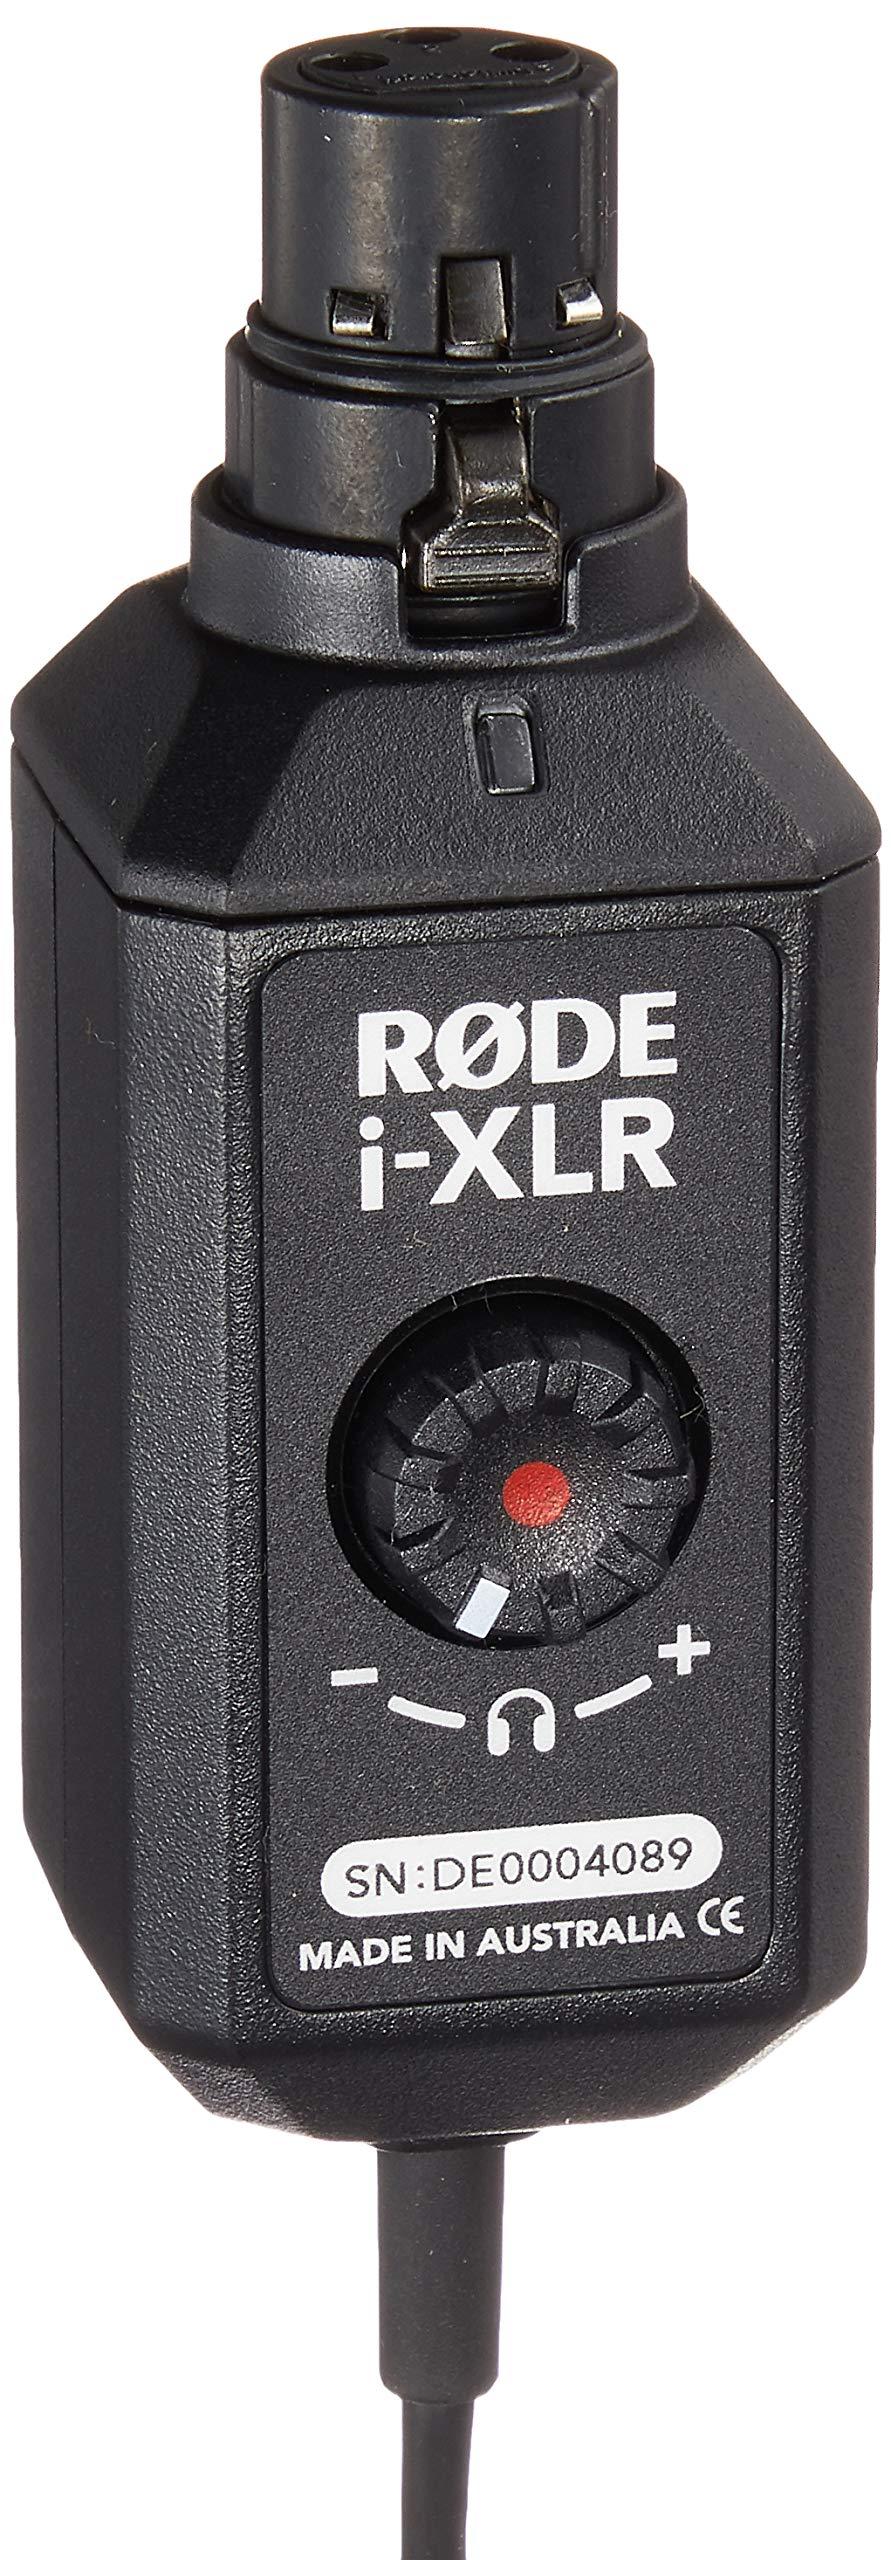 Rode i-XLR Digital XLR Interface para dispositivos Apple iOS